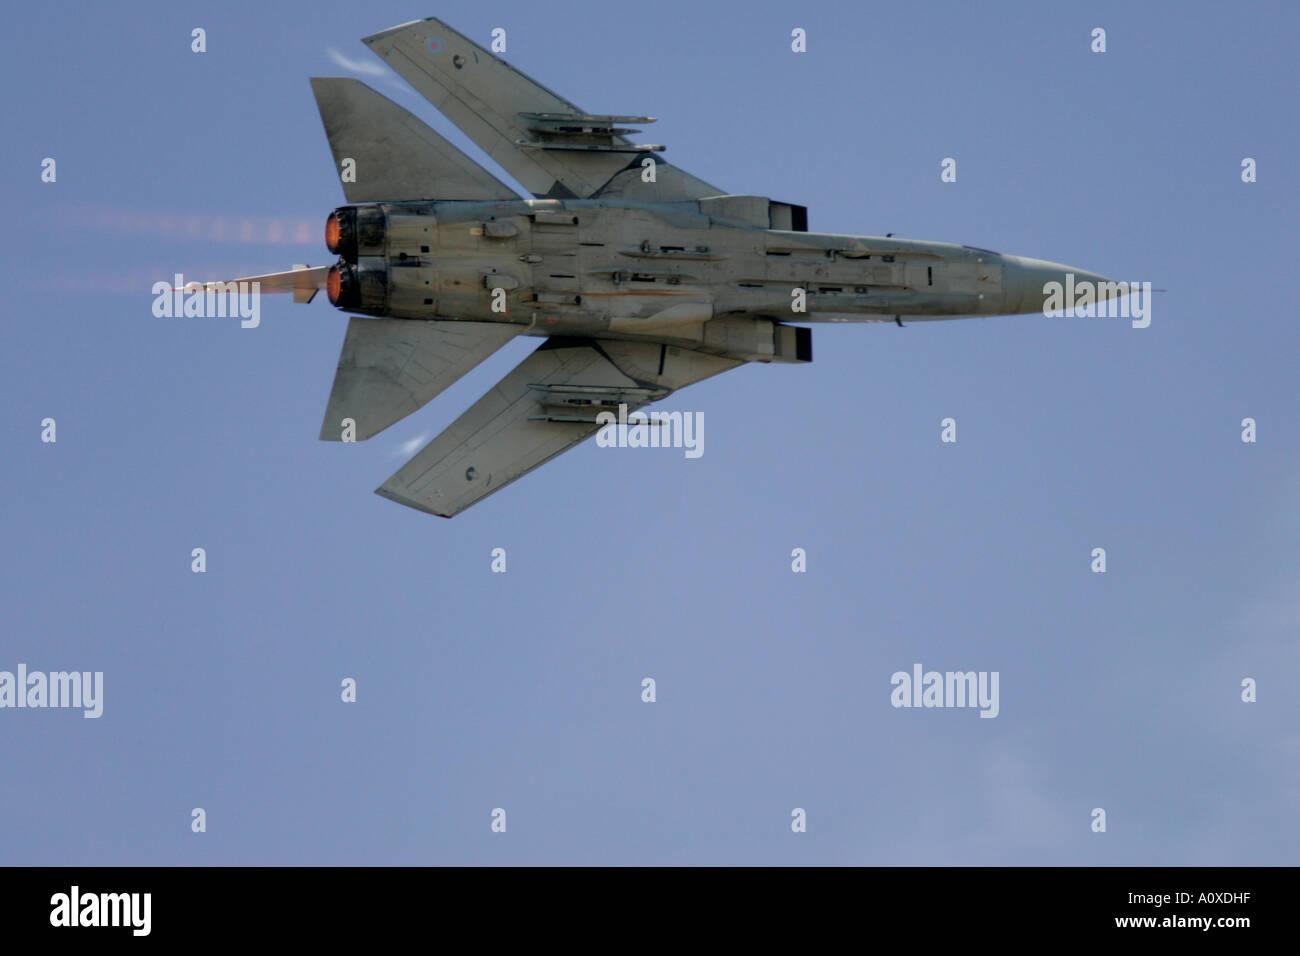 RAF Tornado F3 flying against blue sky on afterburner RIAT 2005 RAF Fairford Gloucestershire England UK - Stock Image